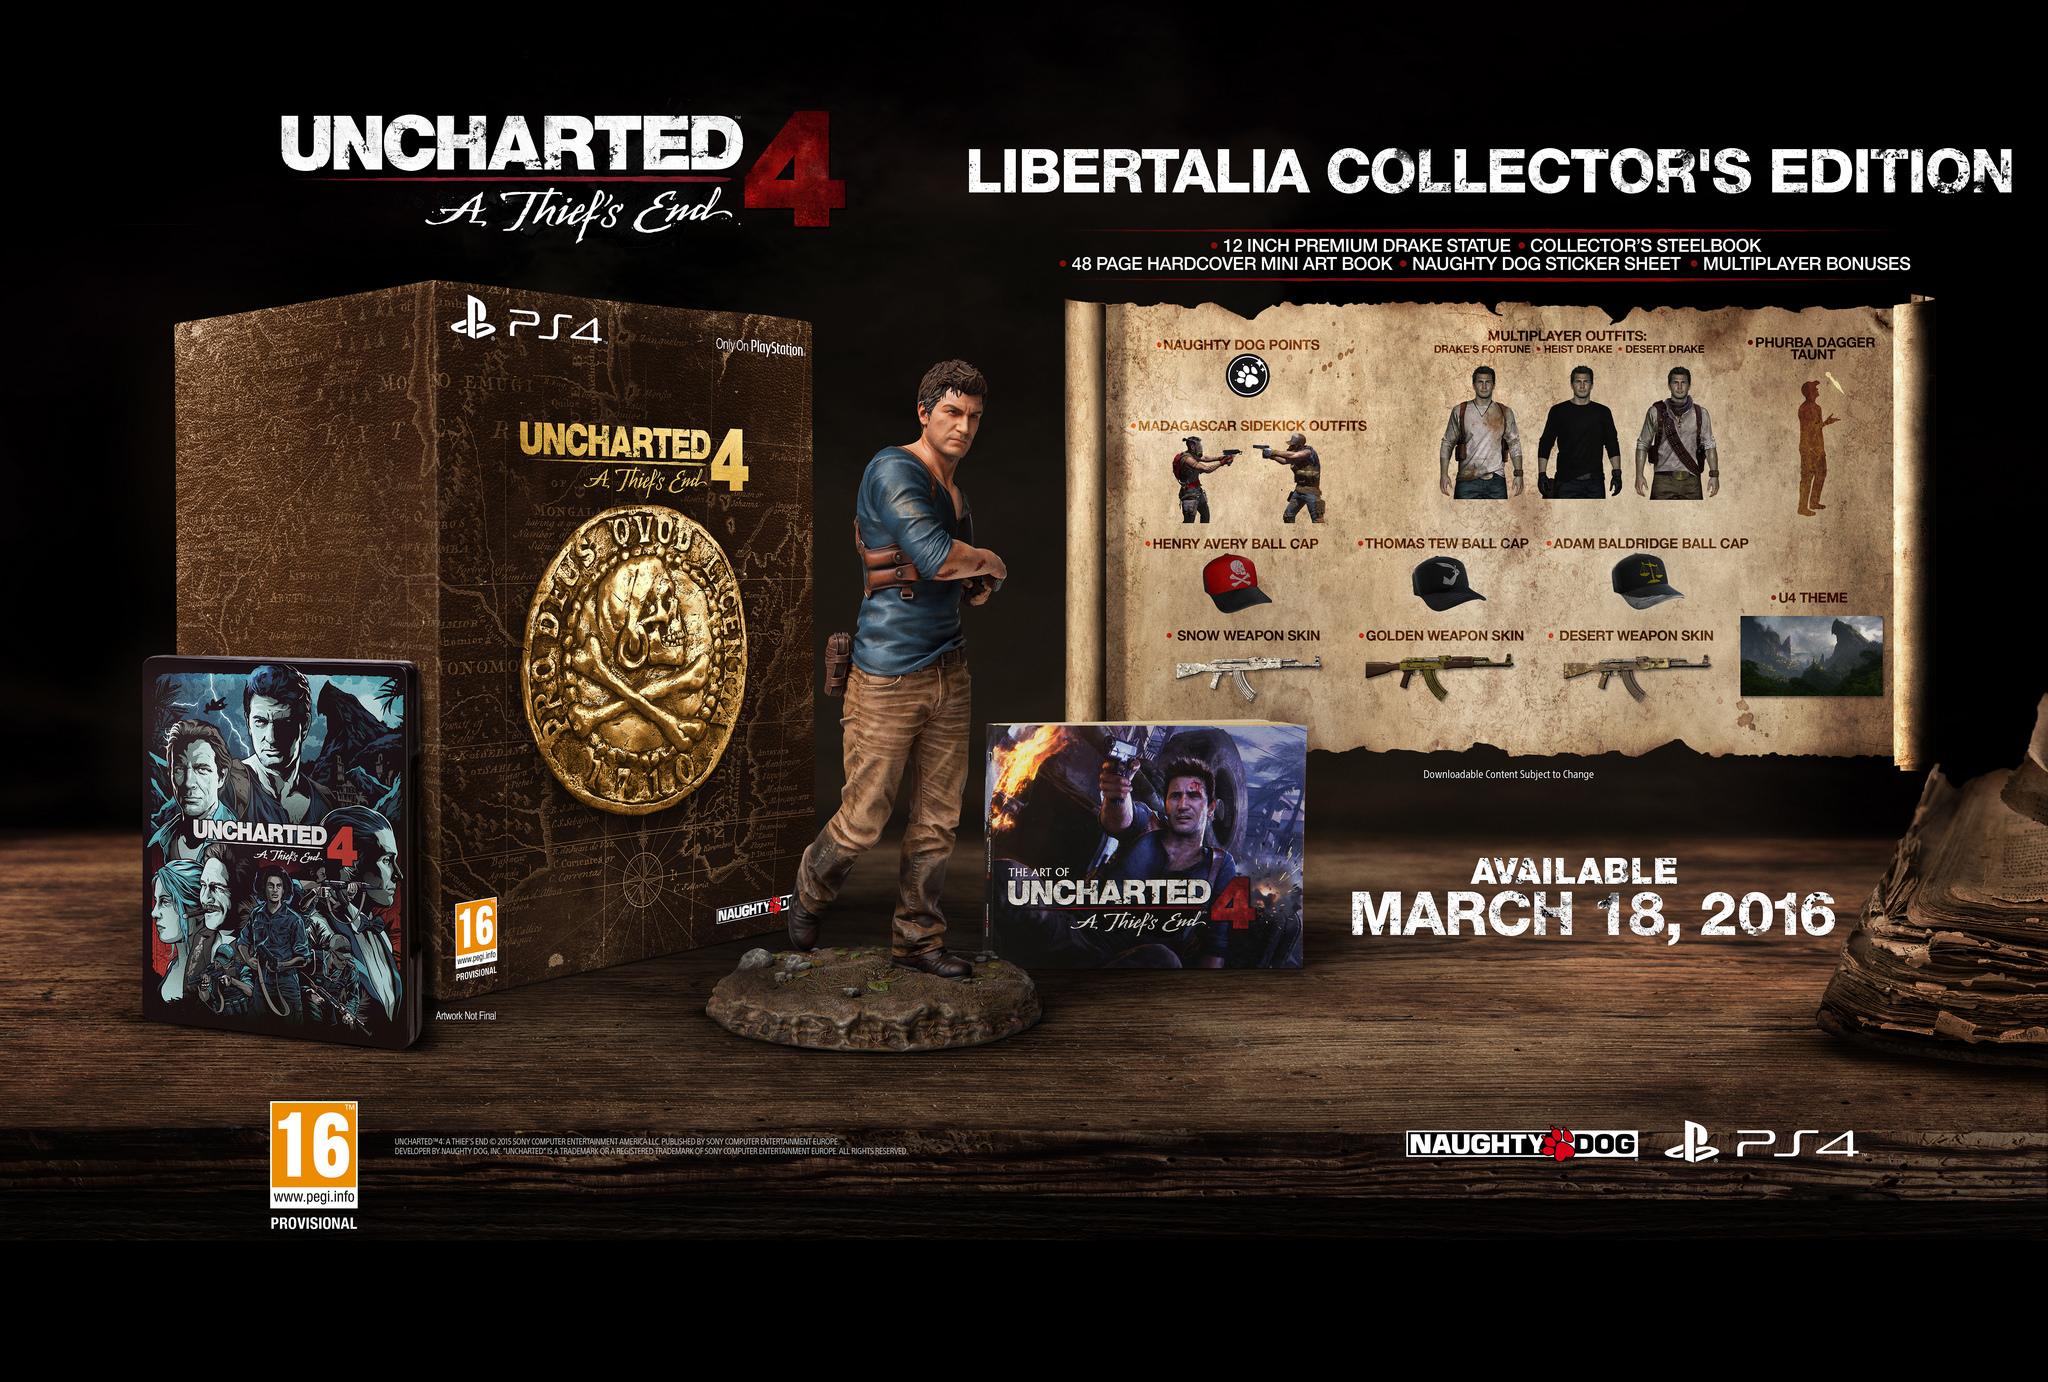 uncharted 4 - pack edicion coleccionista libertalia